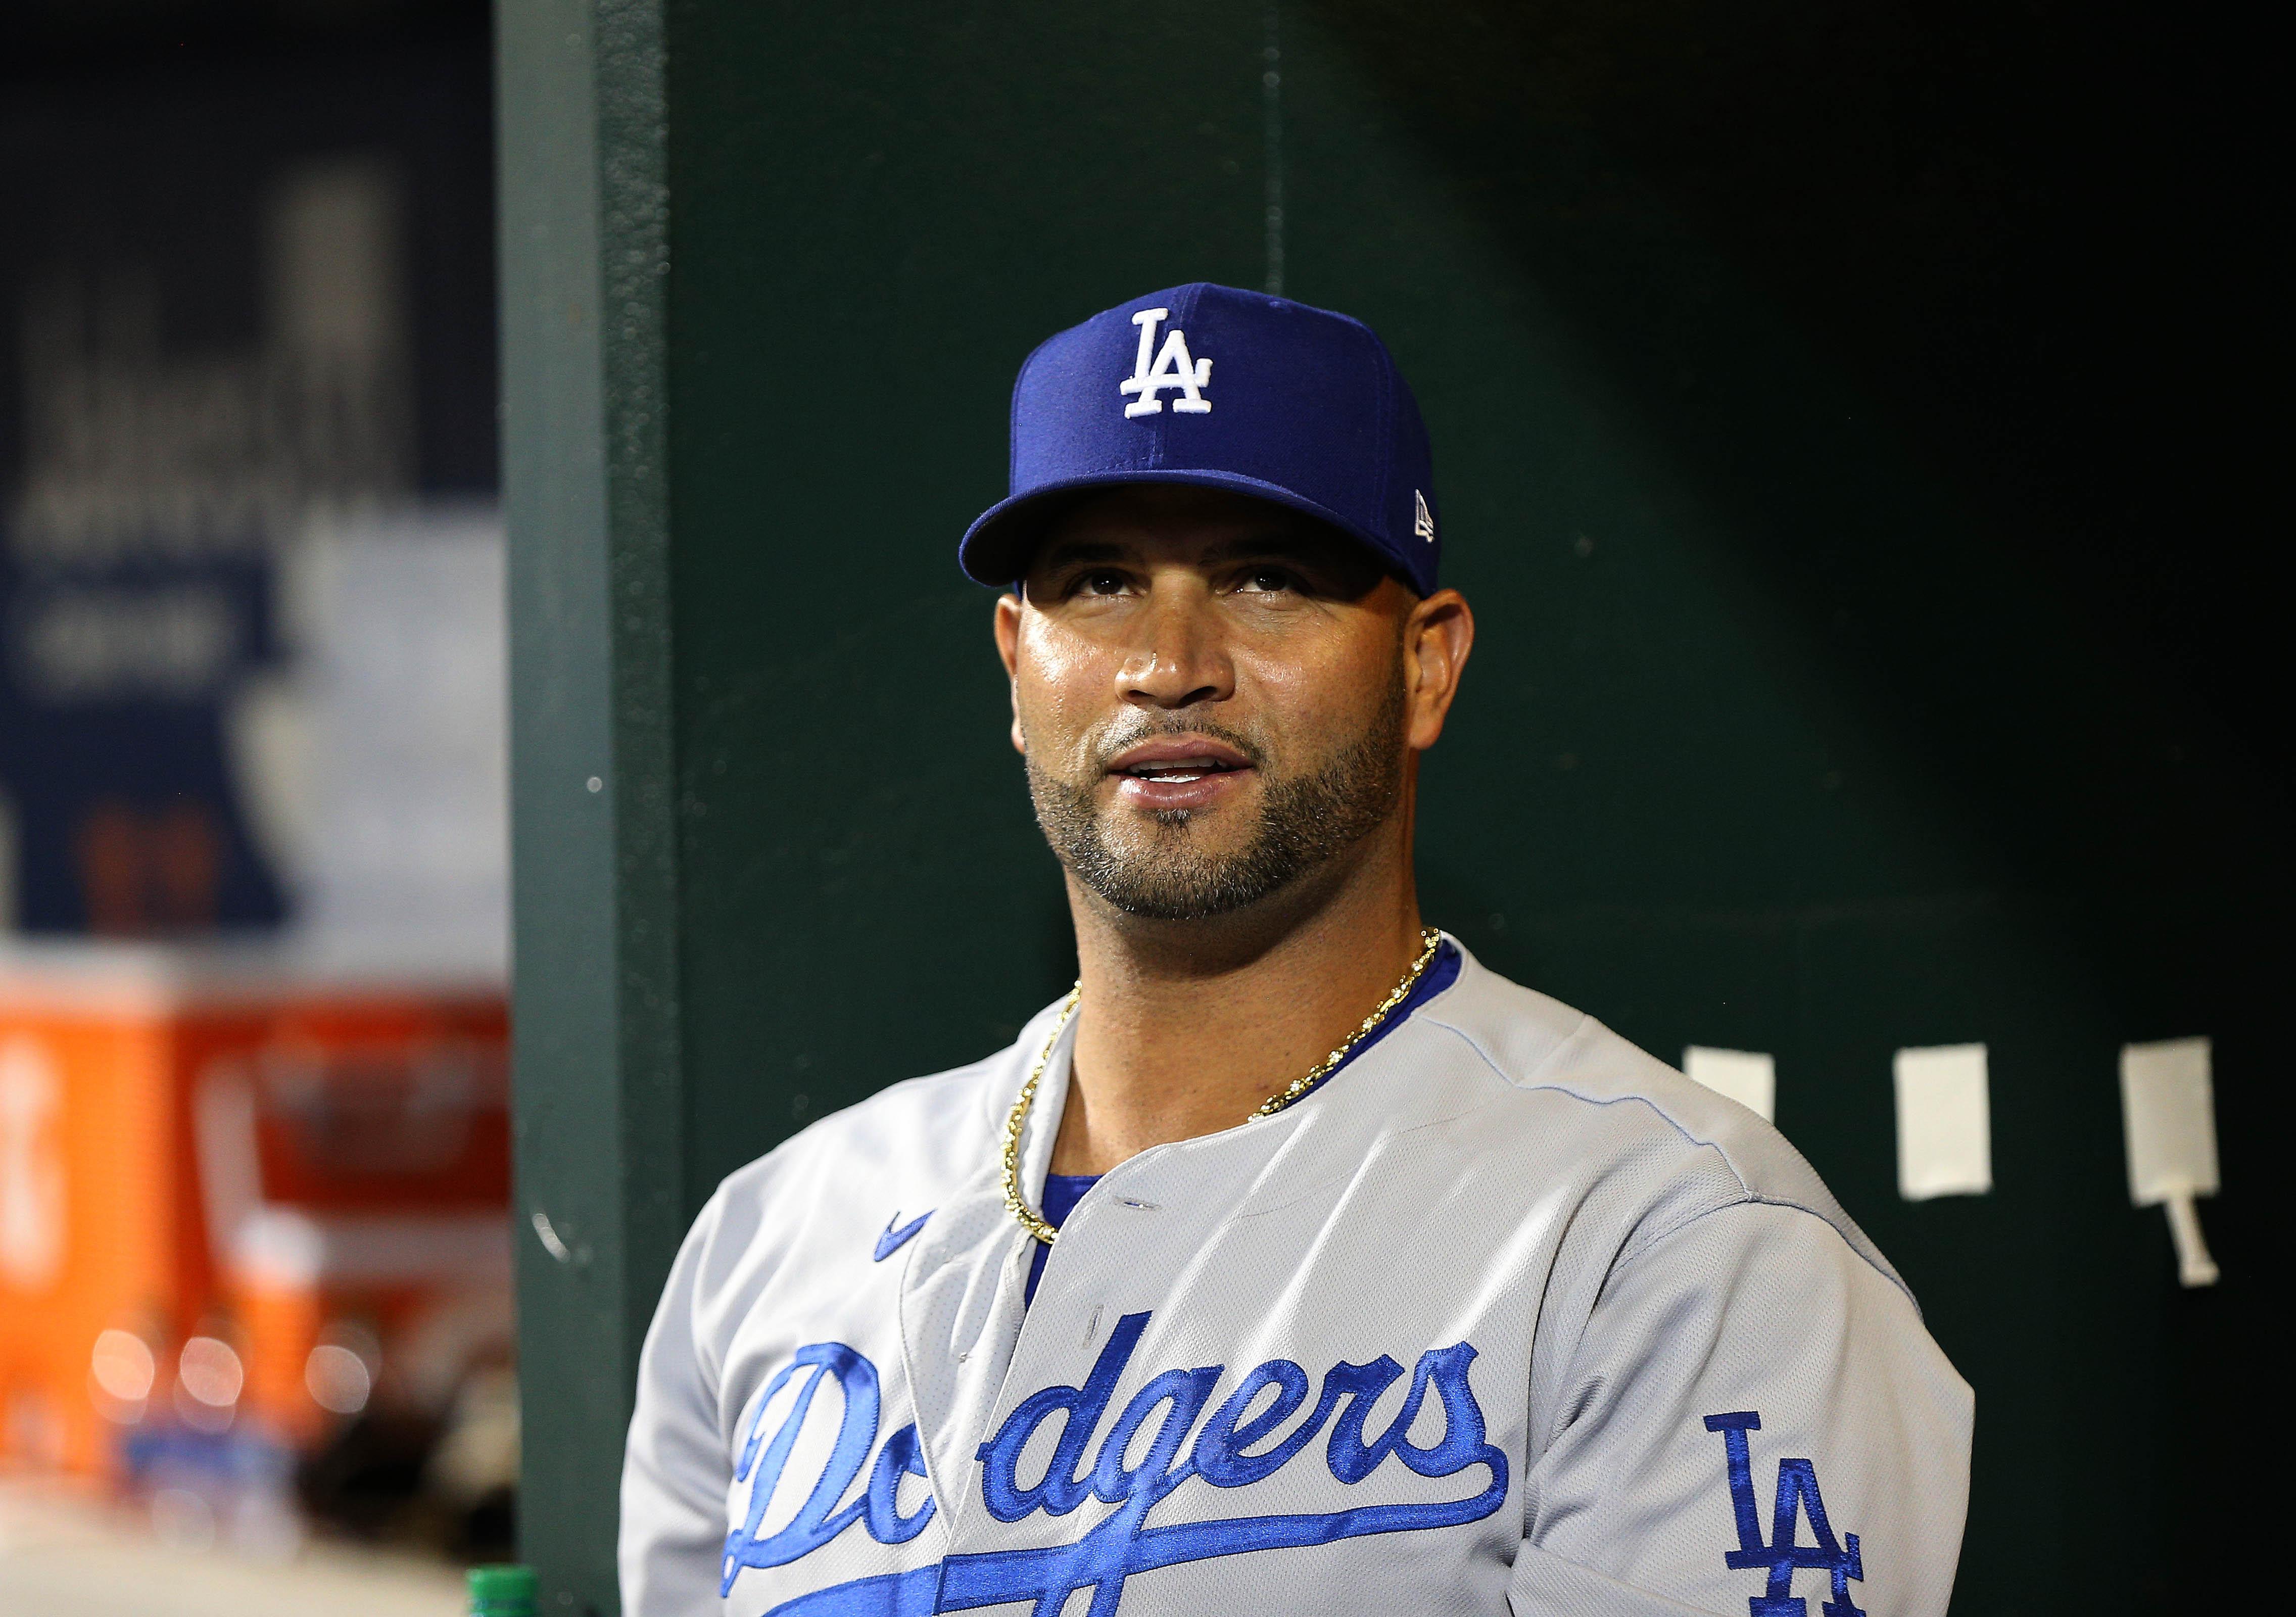 MLB: Los Angeles Dodgers at New York Mets